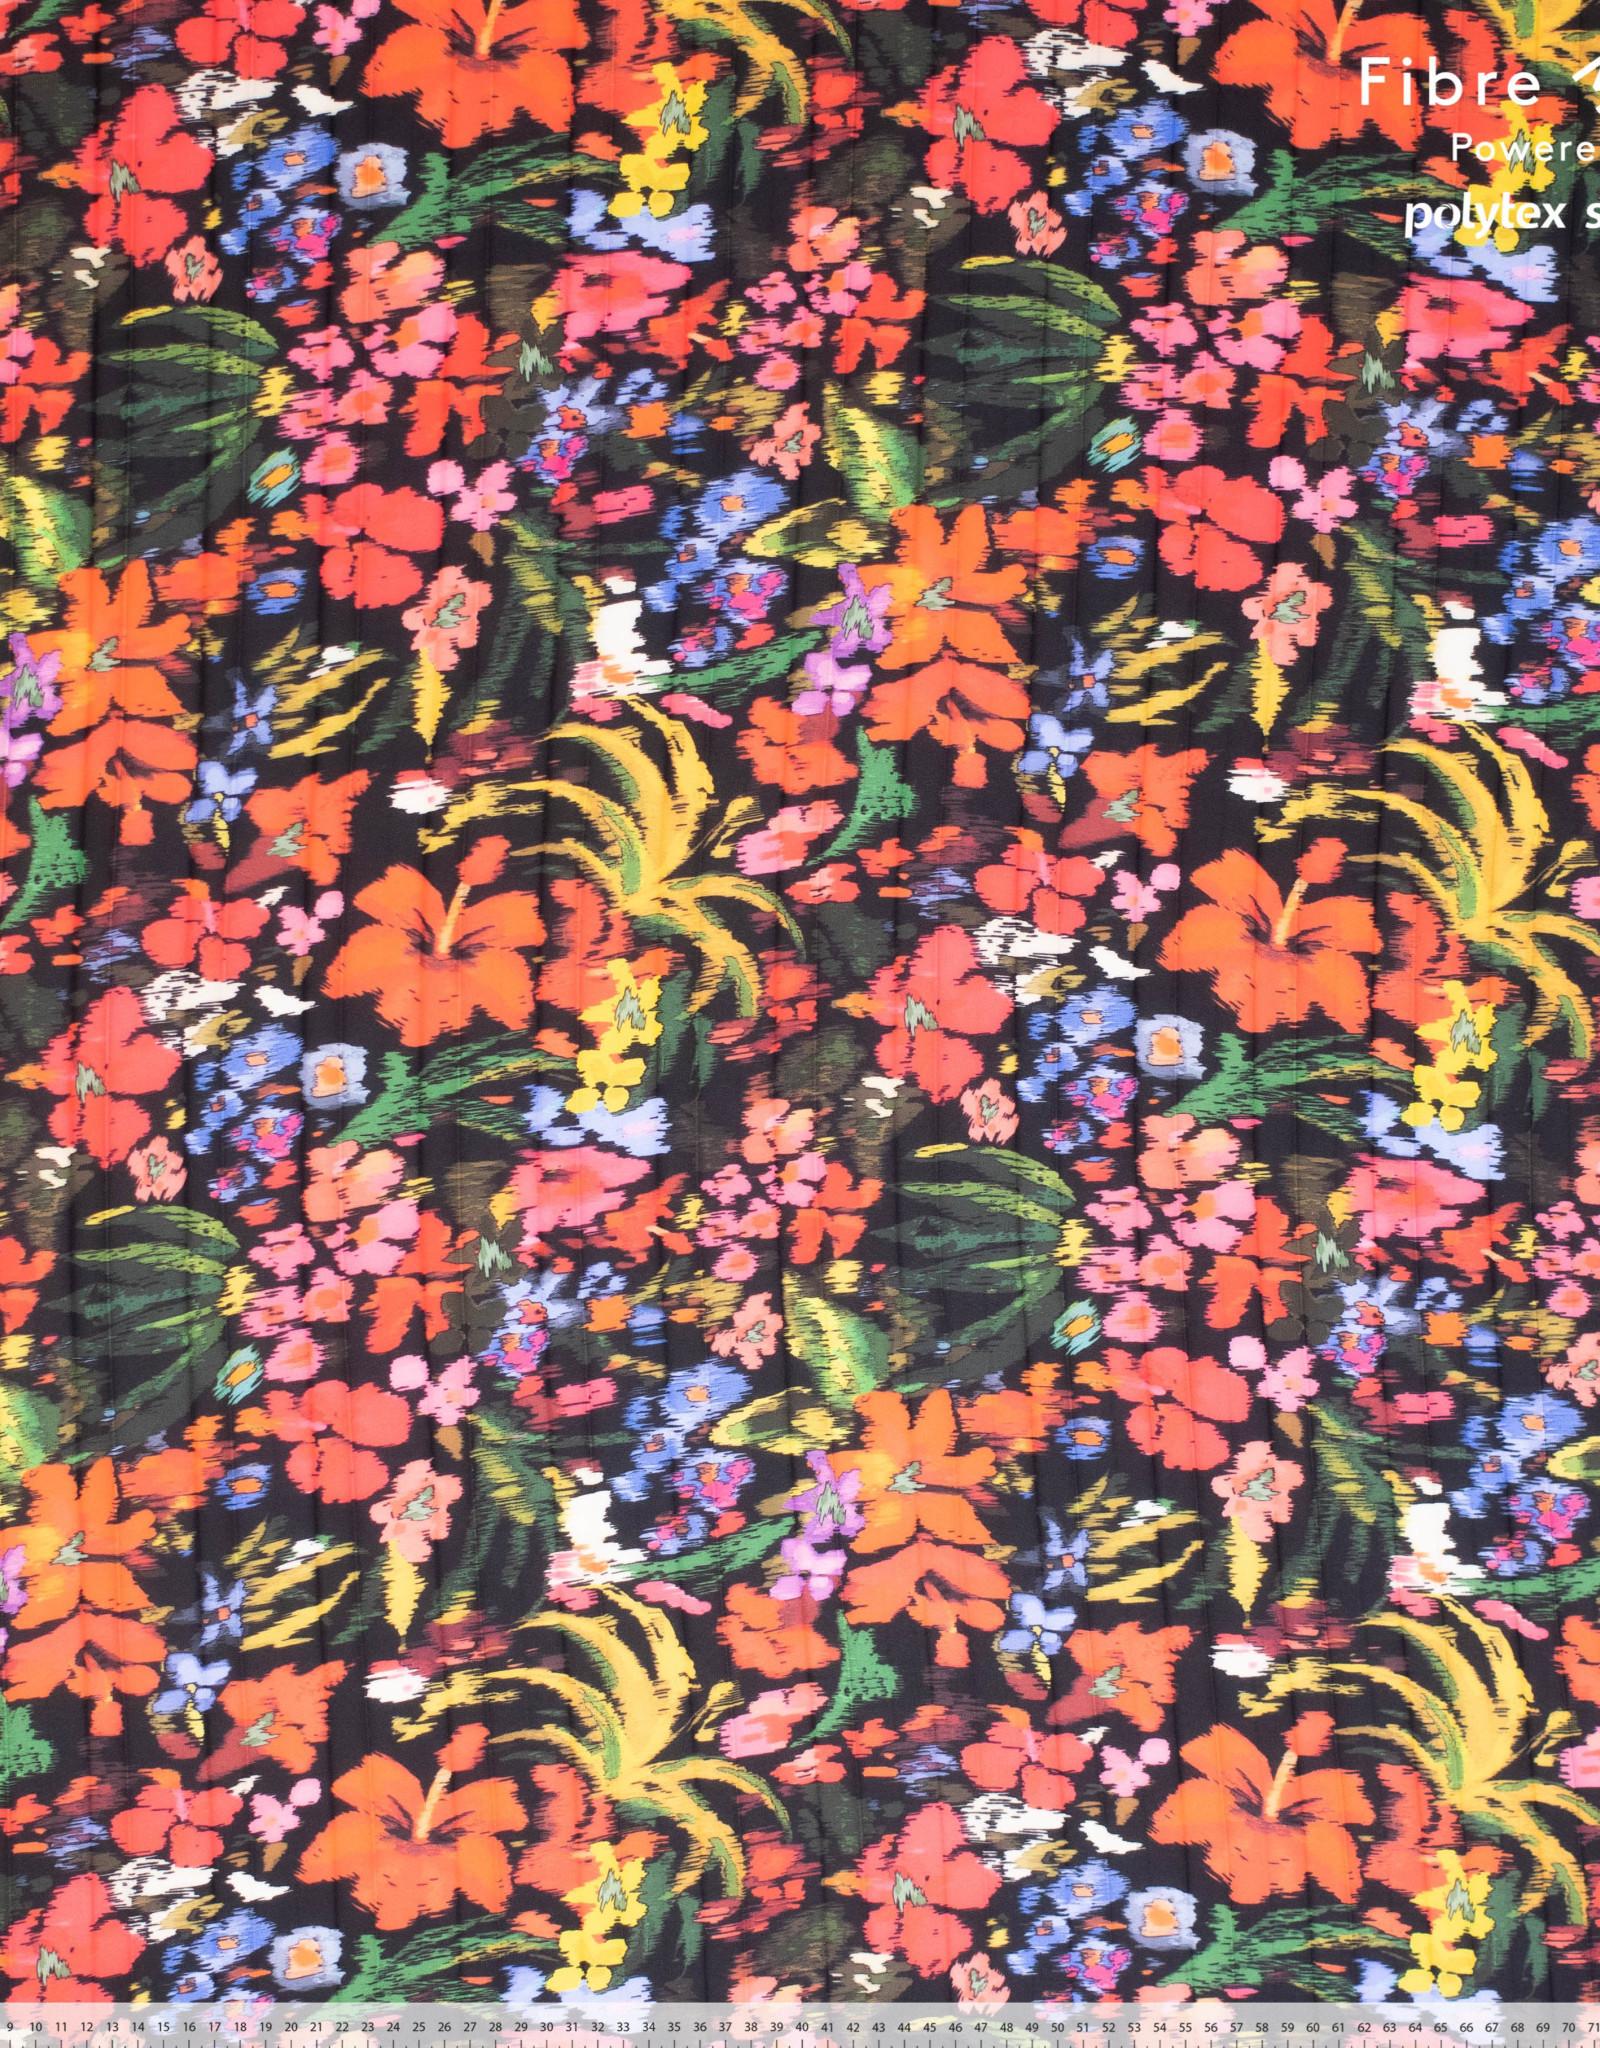 Fibre Mood Fibre Mood ed 14 Woven polyester crepe flower print Bloom + Fiona